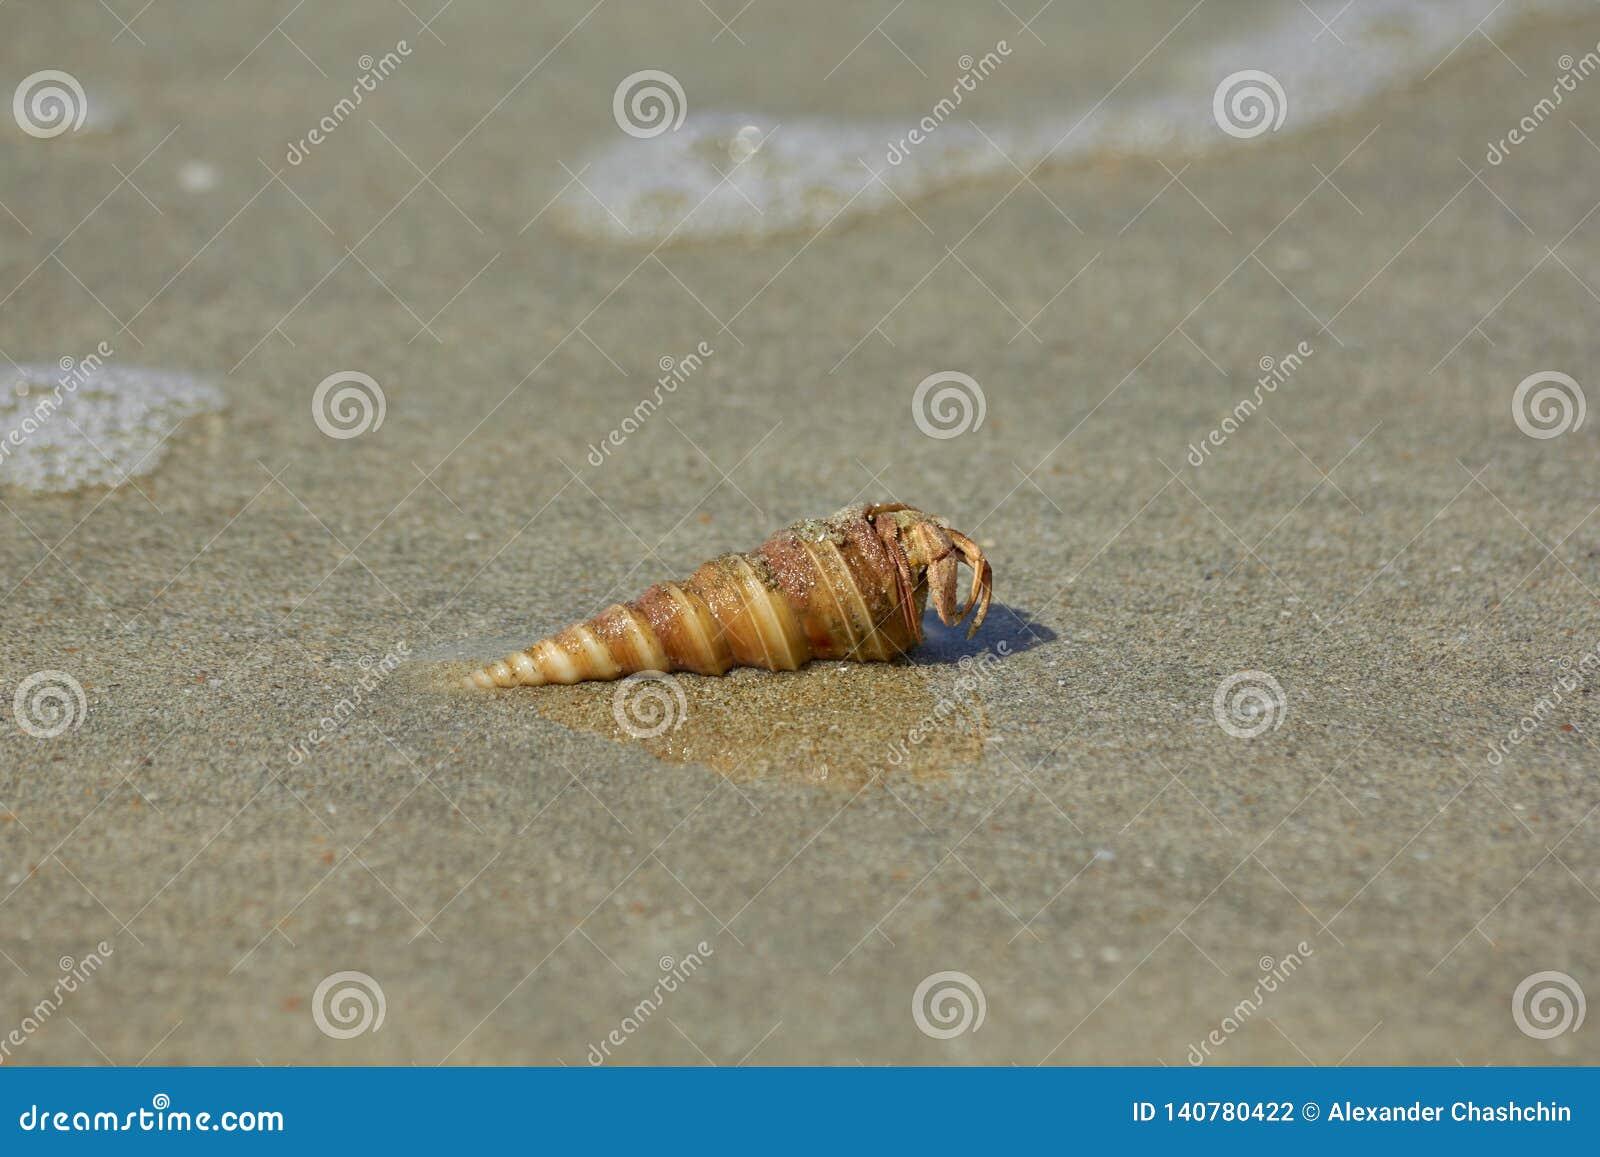 Раковина с крабом затворницы на песке